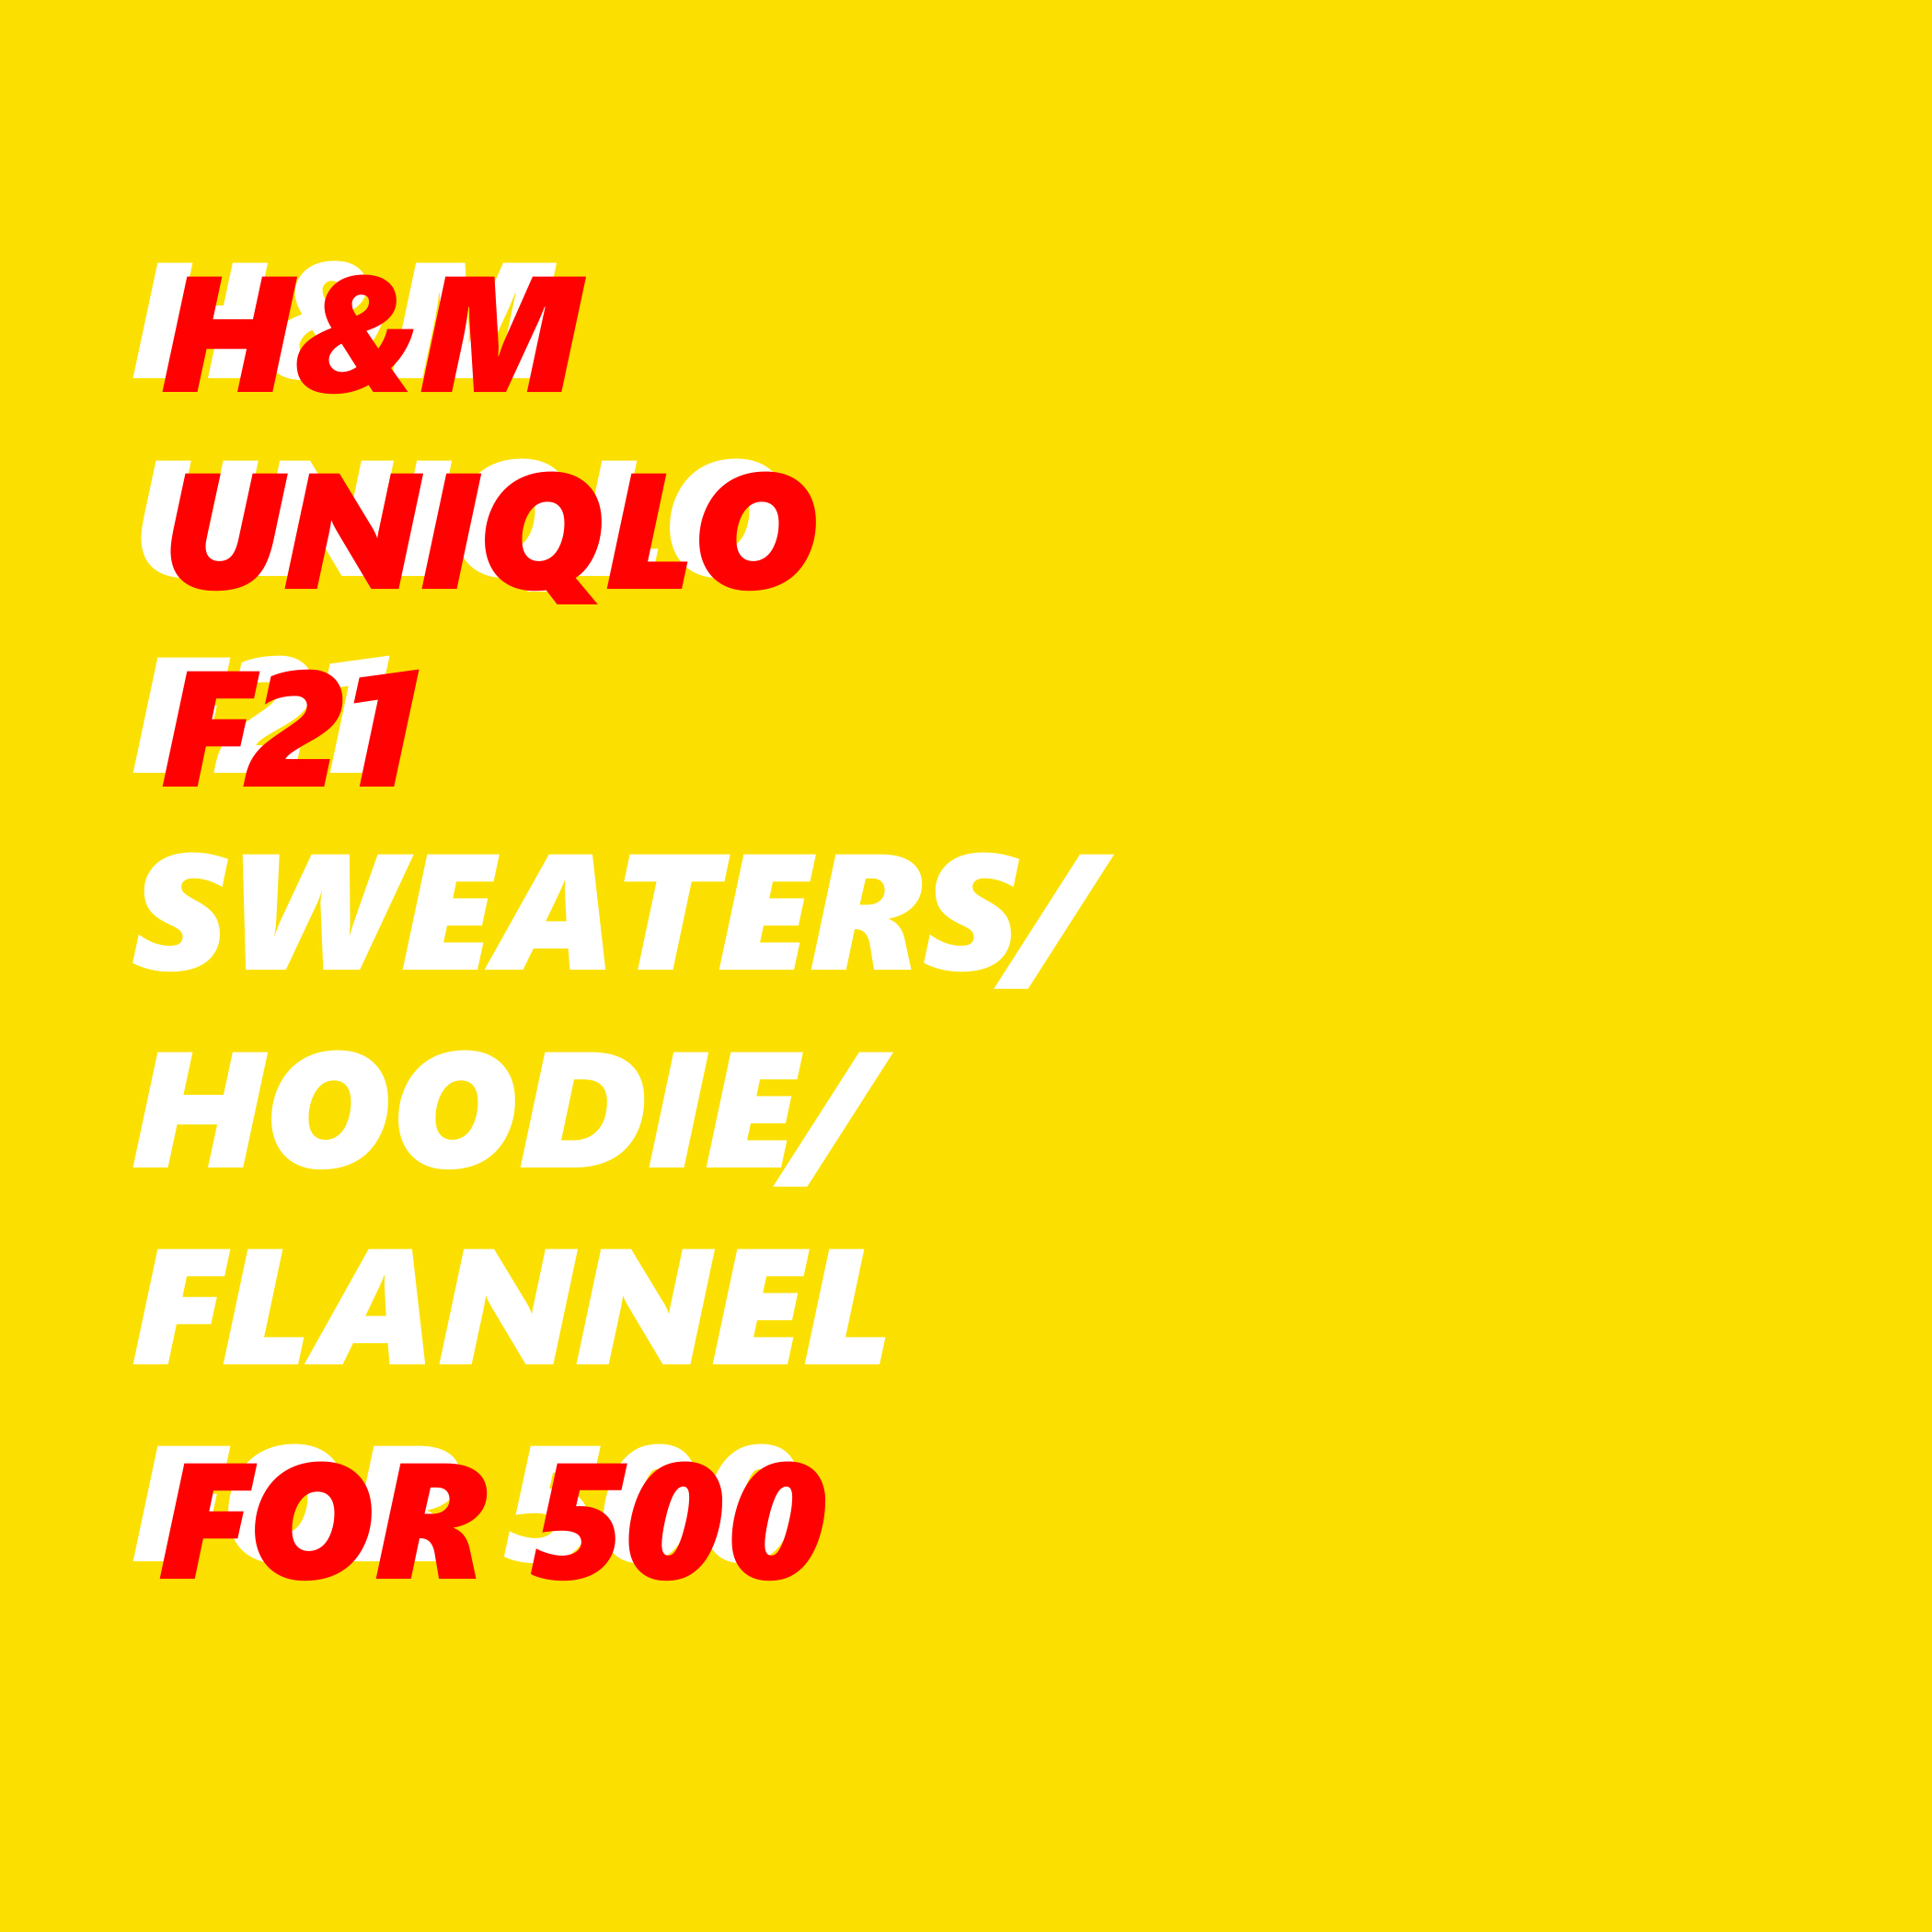 sweaters, hoodie, flannel